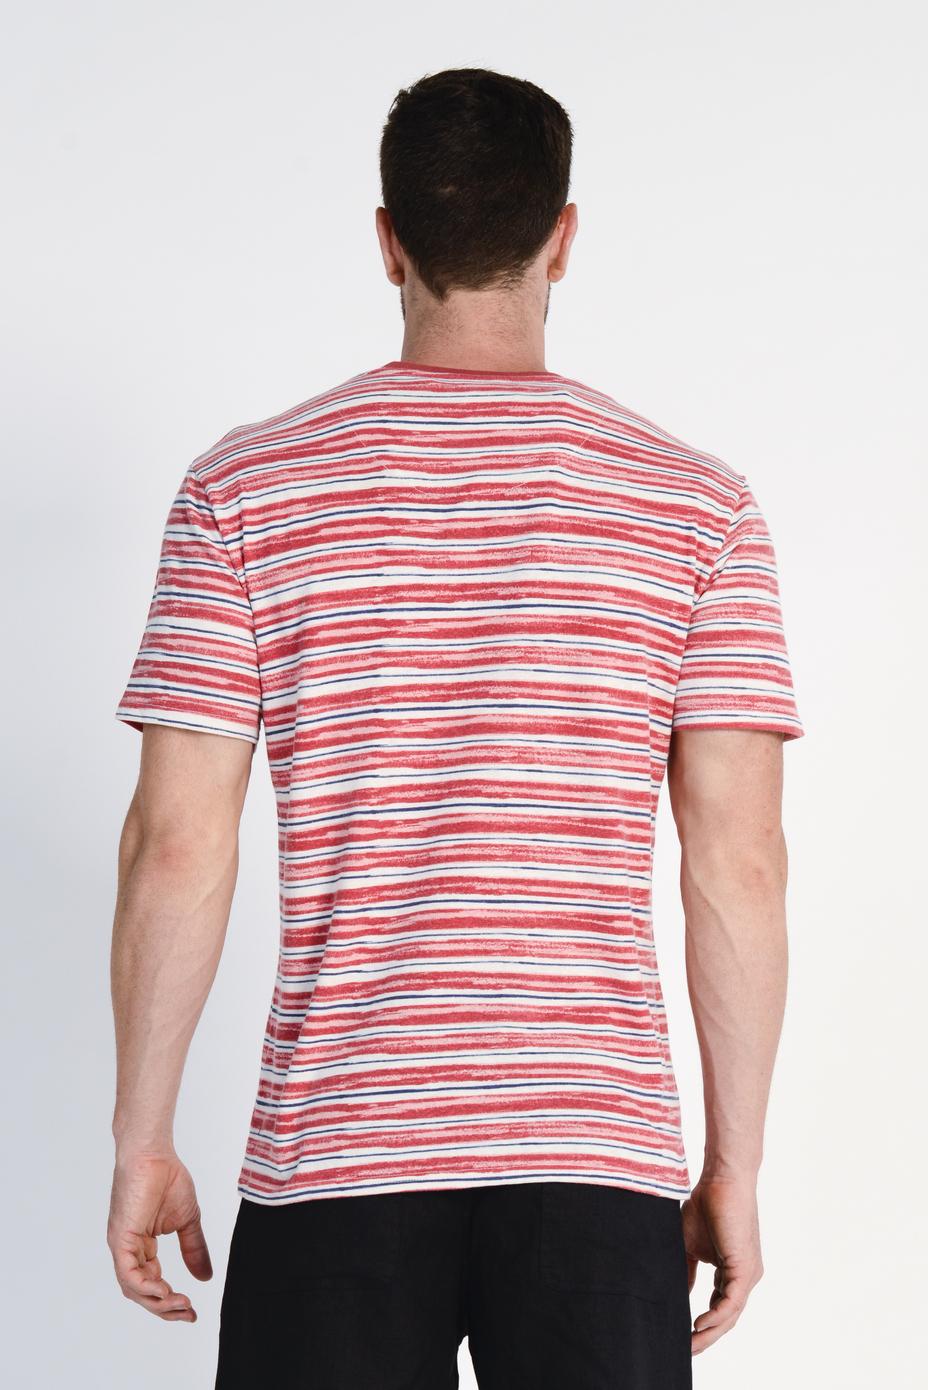 Men's Hemp Cotton Stripe Tee- Red